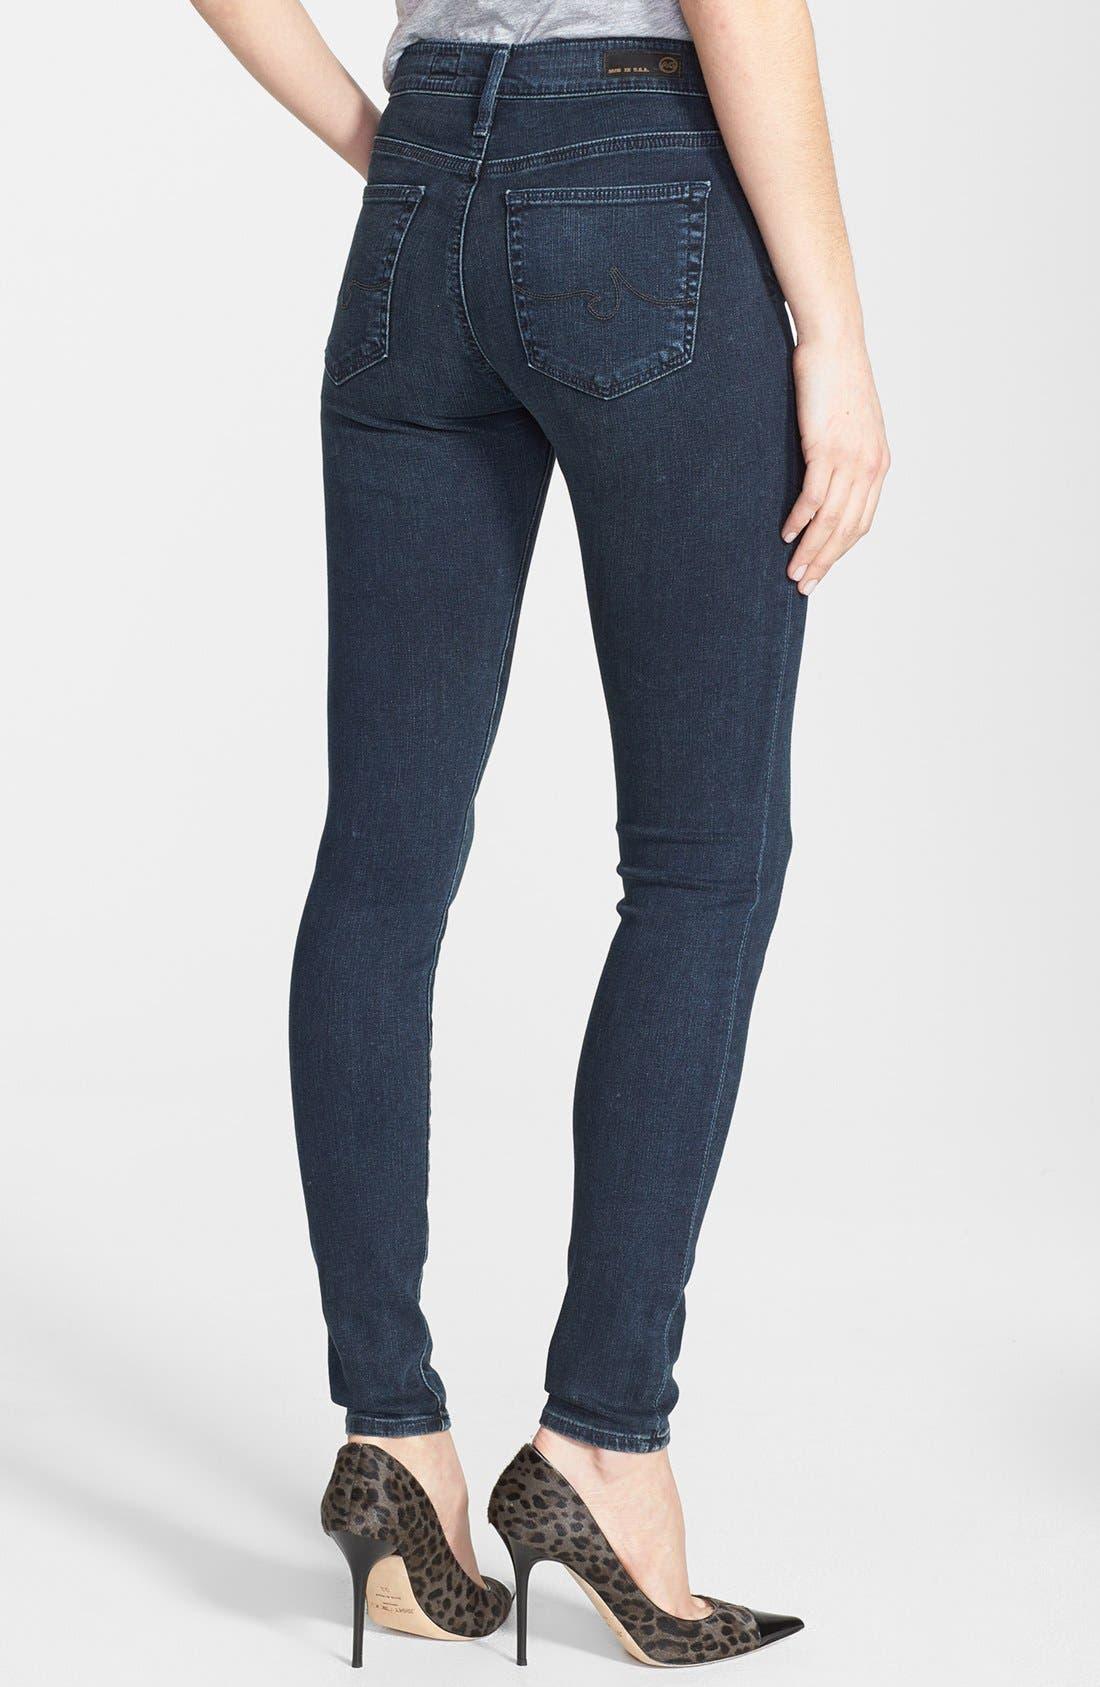 'The Farrah' High Rise Skinny Jeans,                             Alternate thumbnail 21, color,